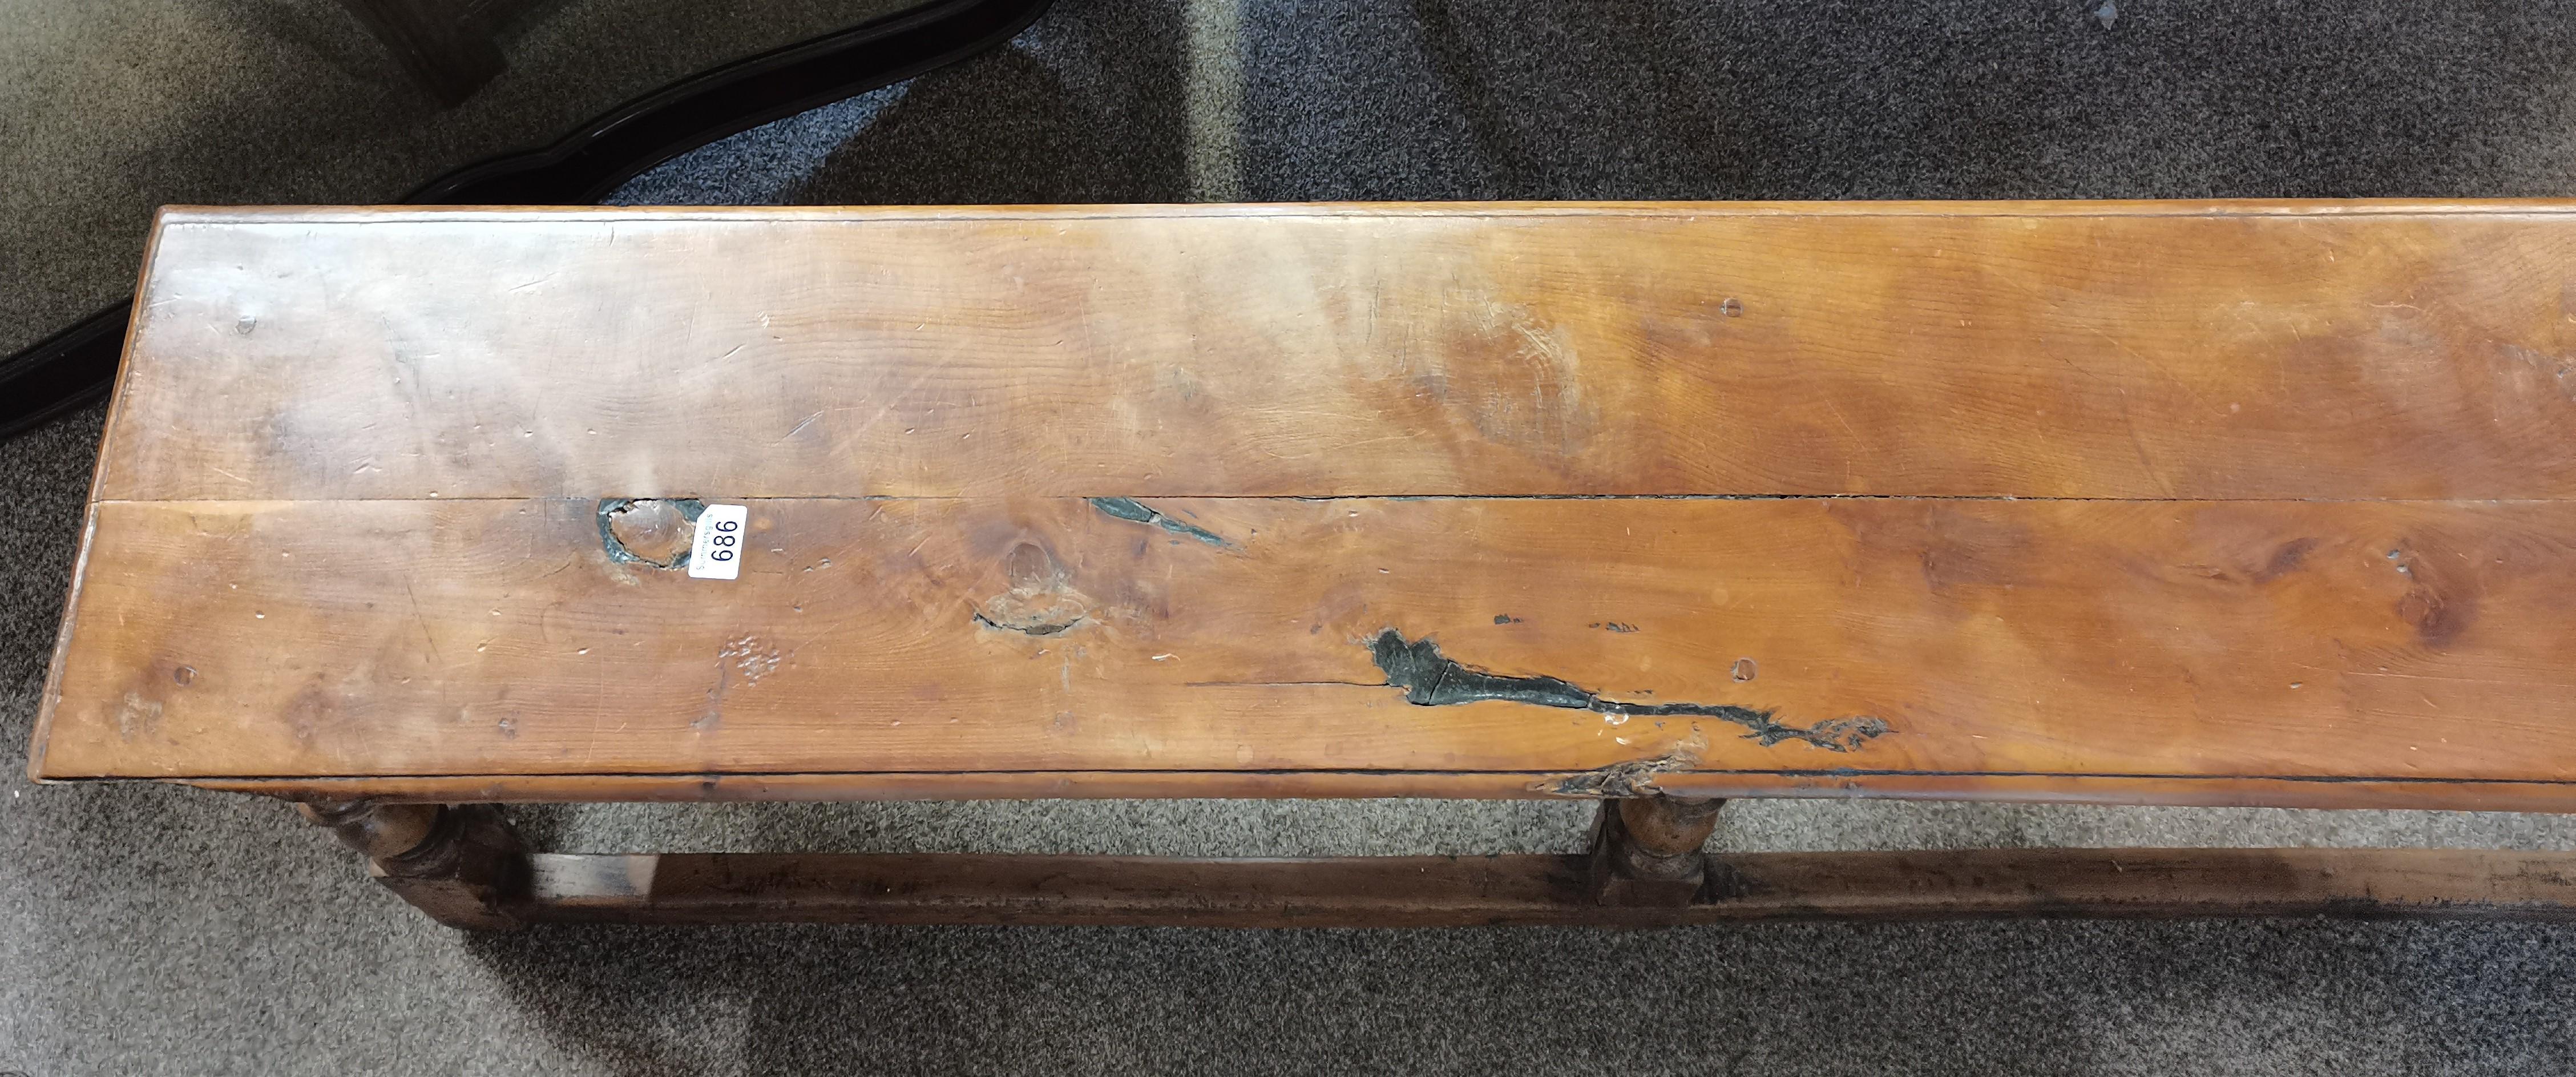 1.7m long early yew wood long stool - Image 3 of 3